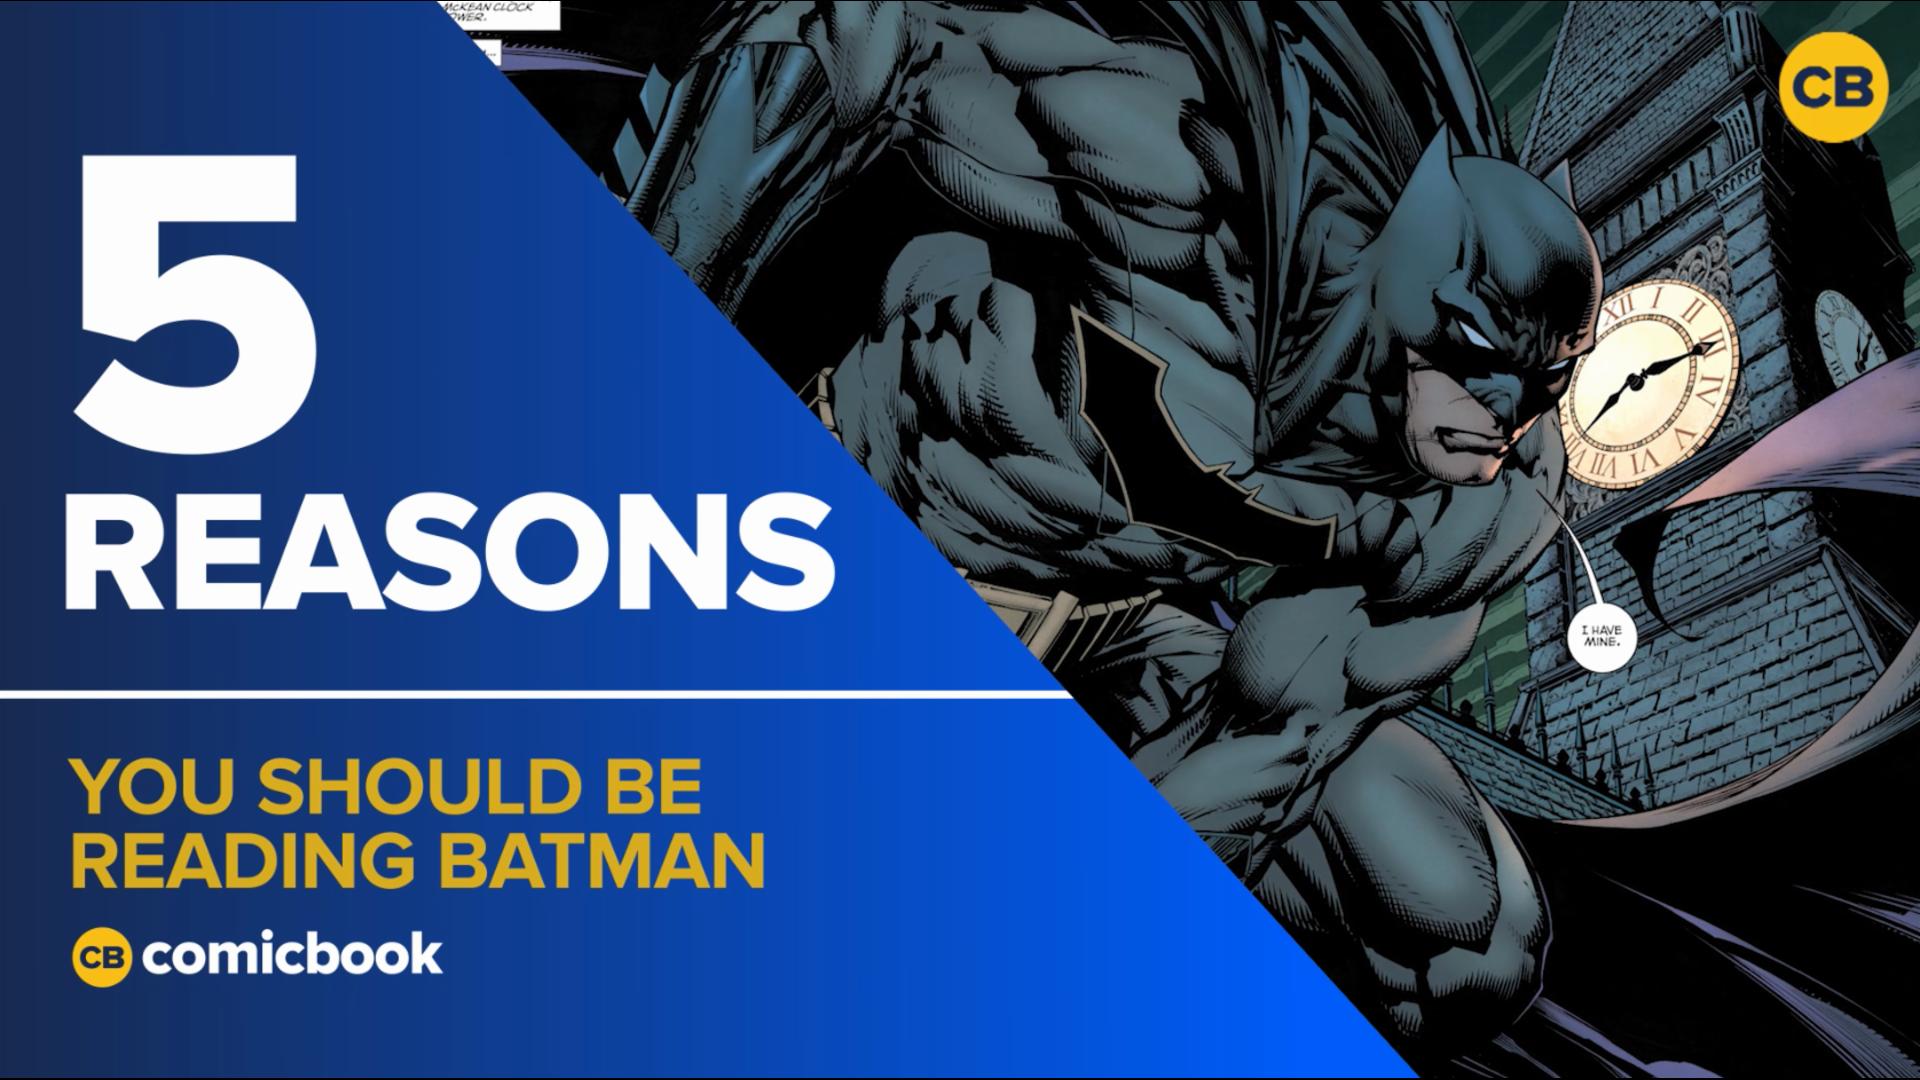 5 Reasons You Should be Reading Batman screen capture